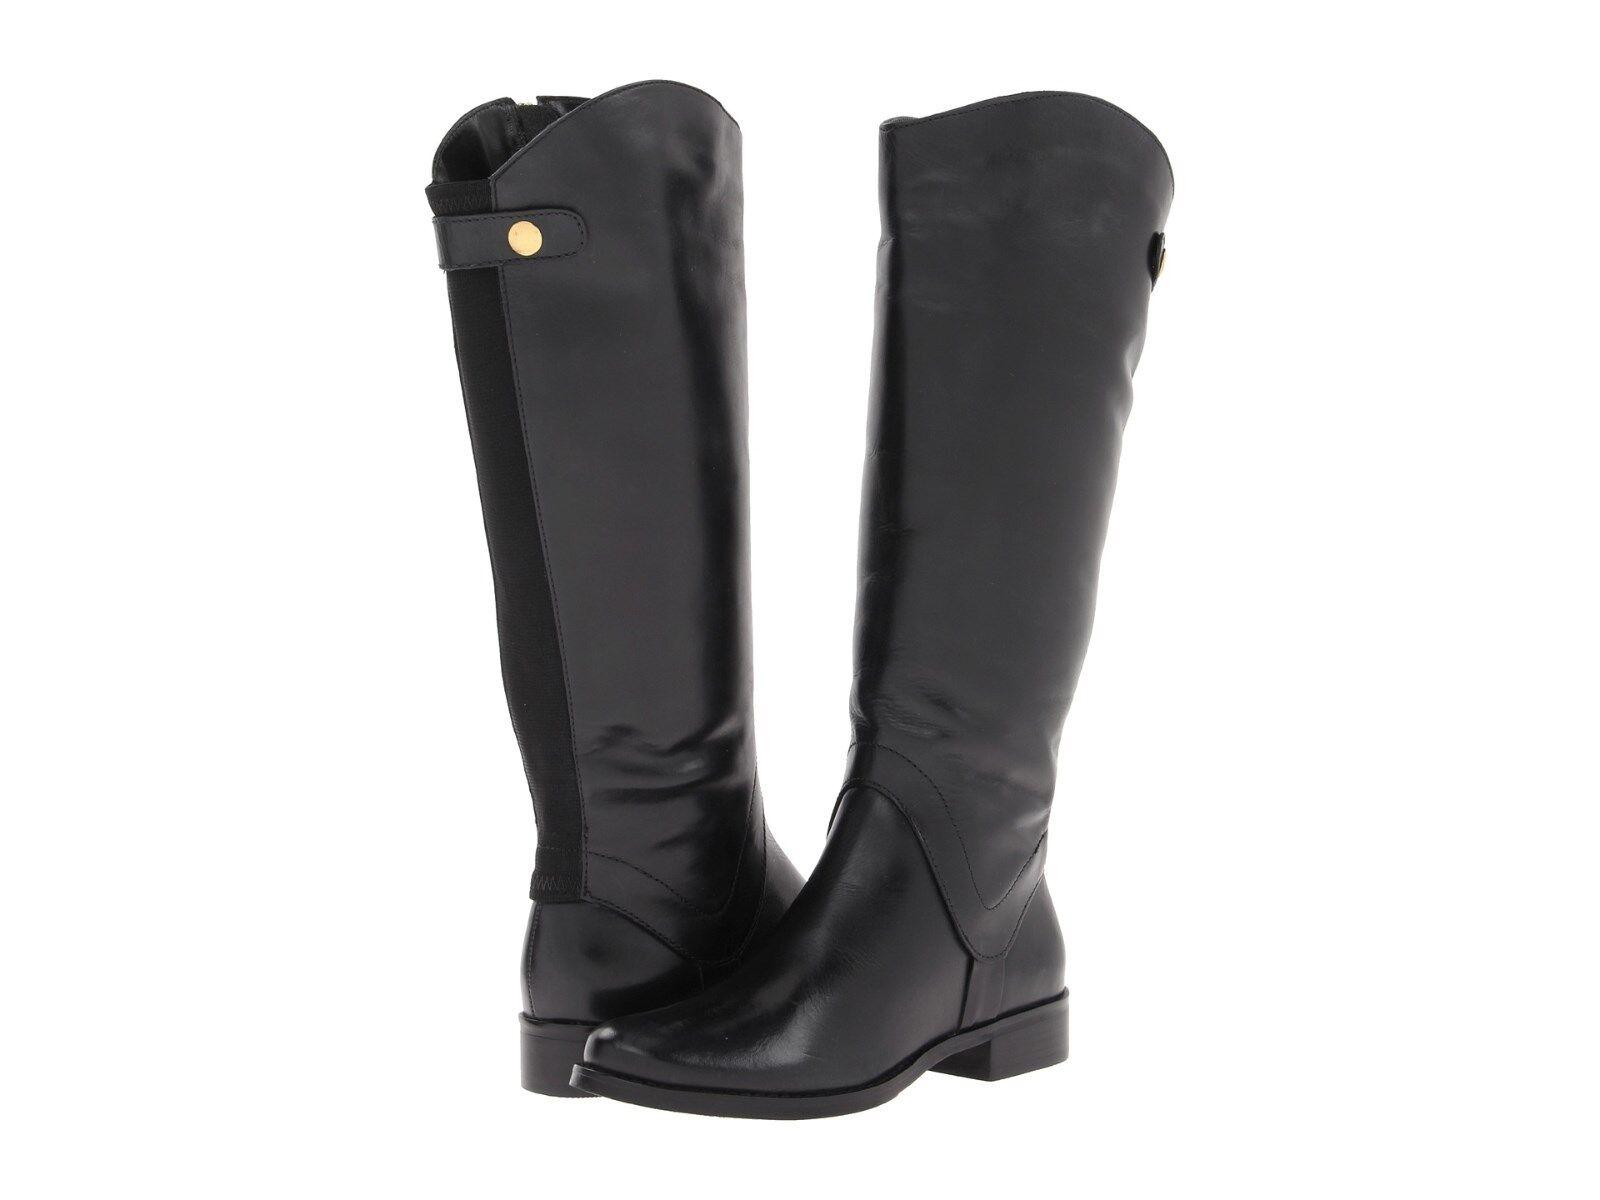 Steven Sady Women's Boots  Leather